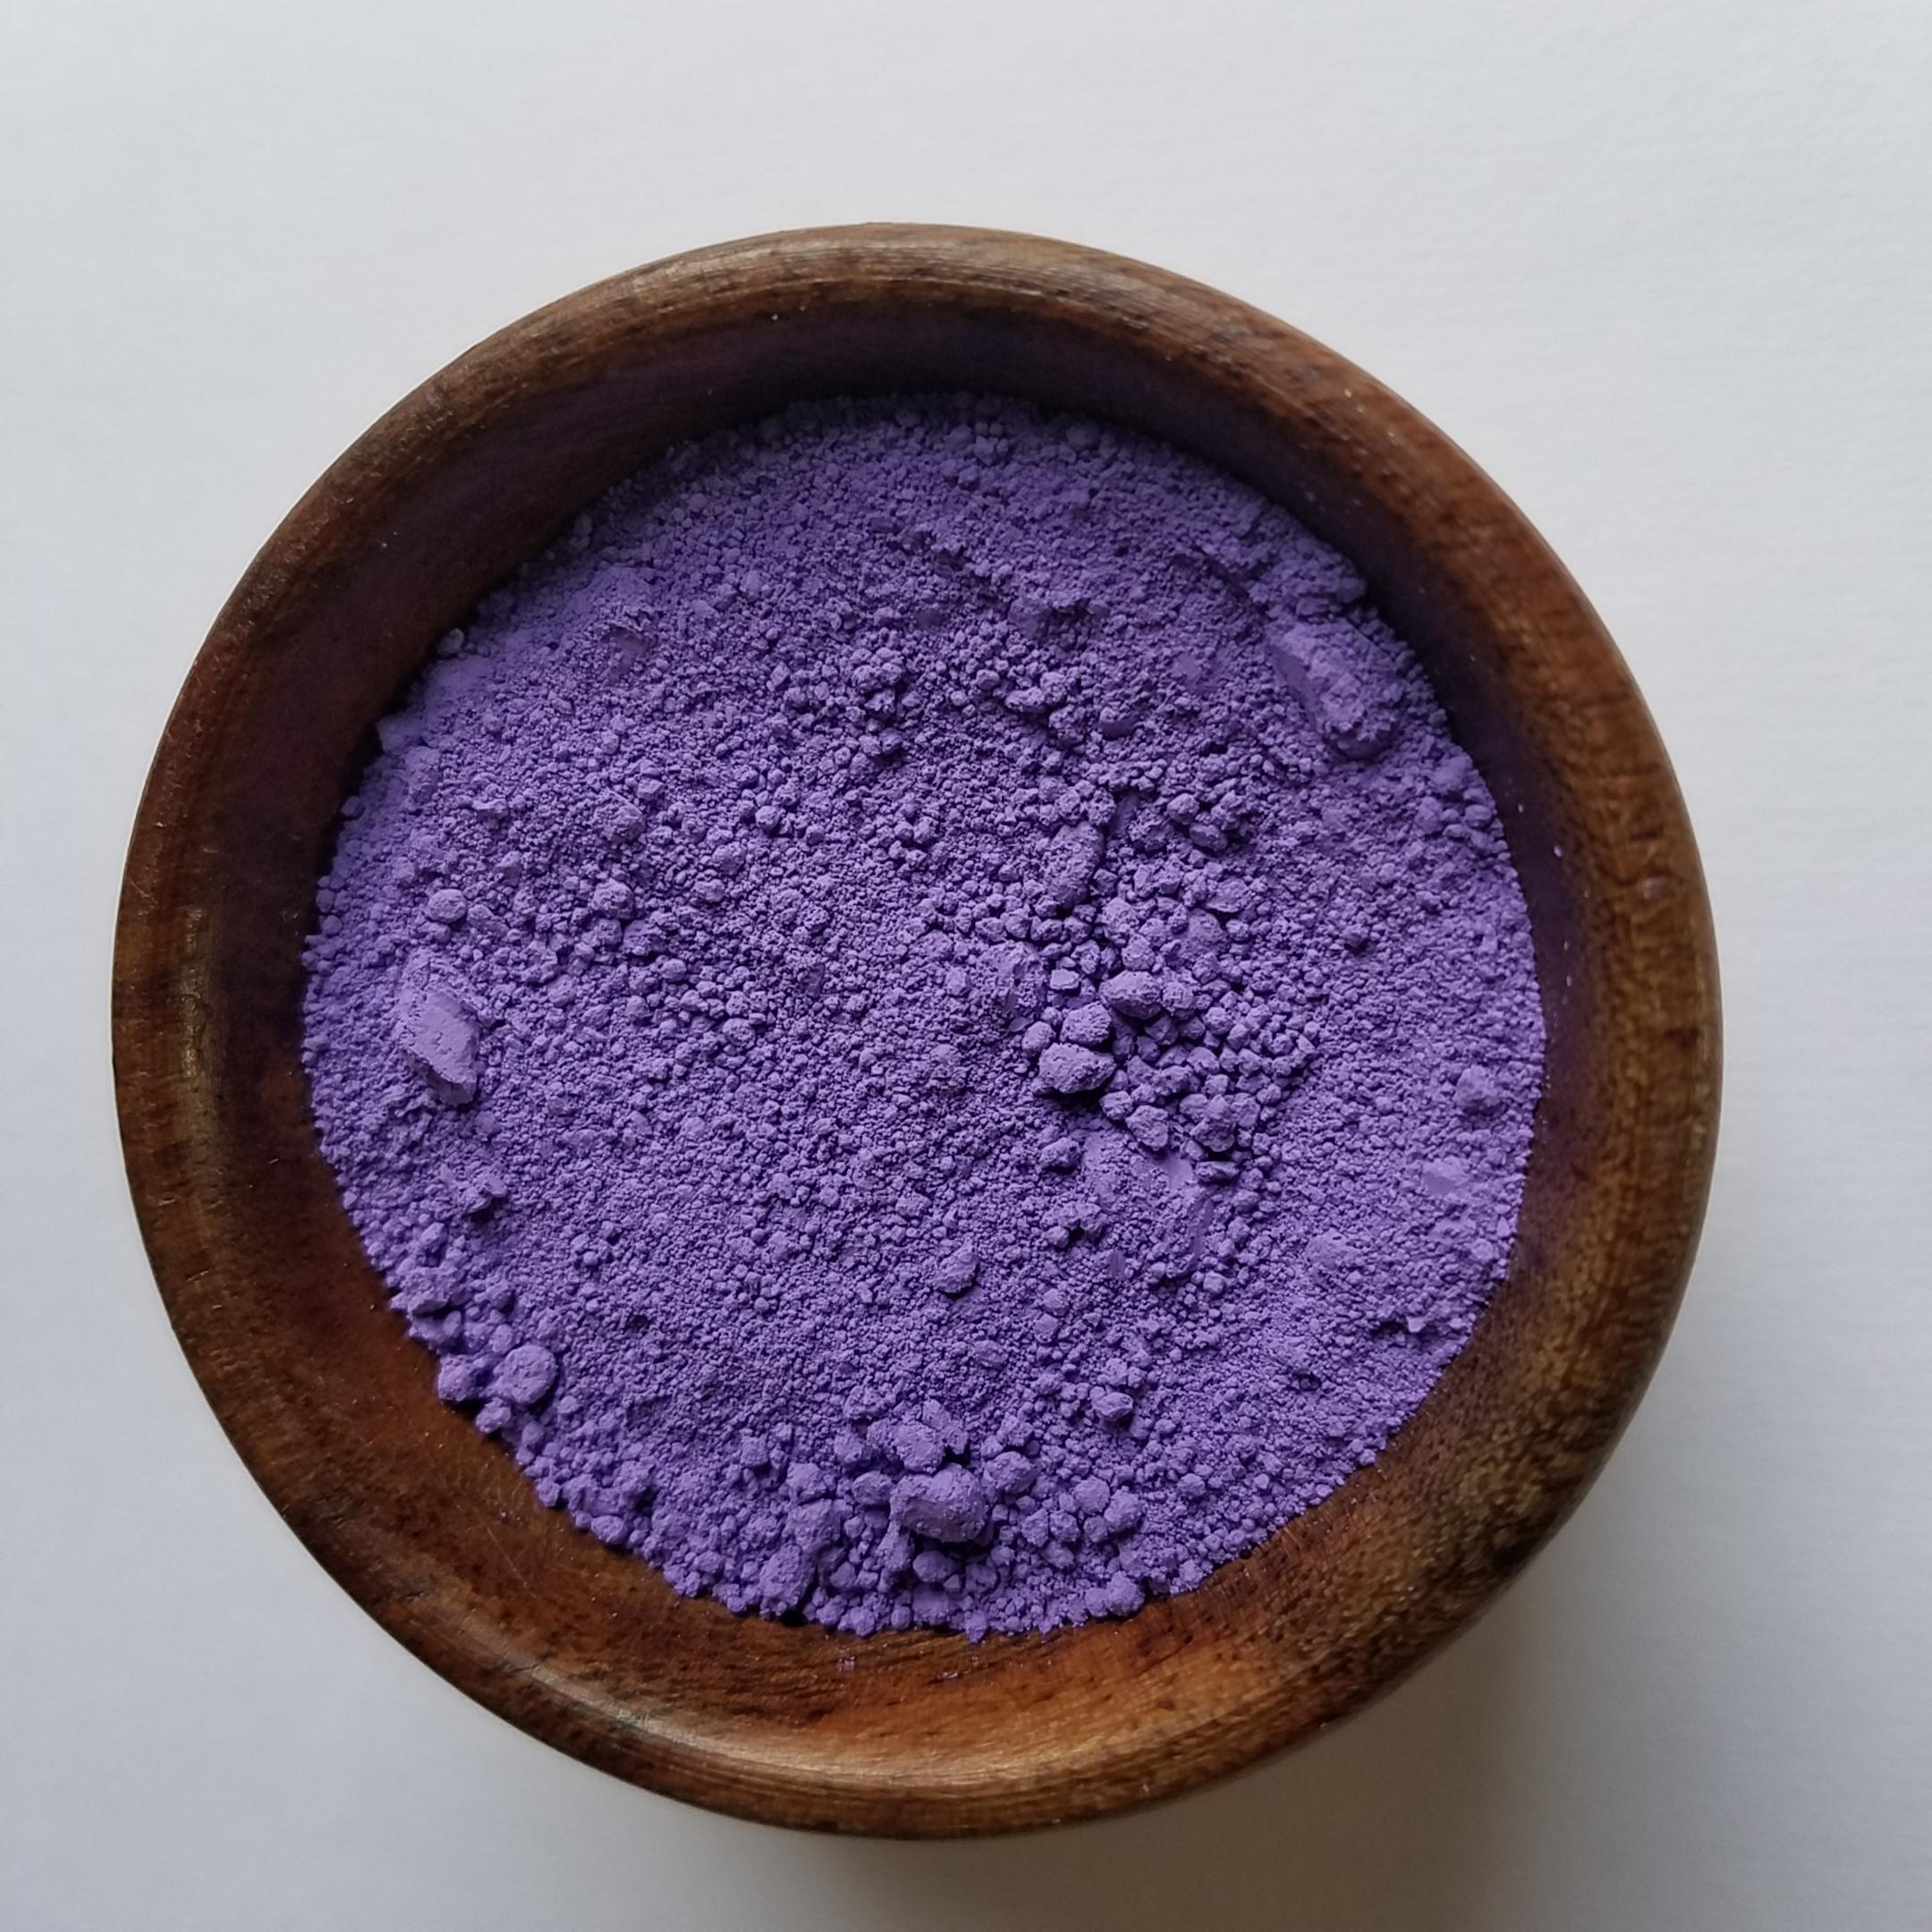 Lavender Pigment, 30 Gram, 1 Ounce, (30g) Mica Pigment, MATTE, Cosmetic Grade Pigment, Soap Making Supplies, Bath Bomb Colorant, Slime Pigment, Craft Pigment, Art Pigment, Purple Mica Powder